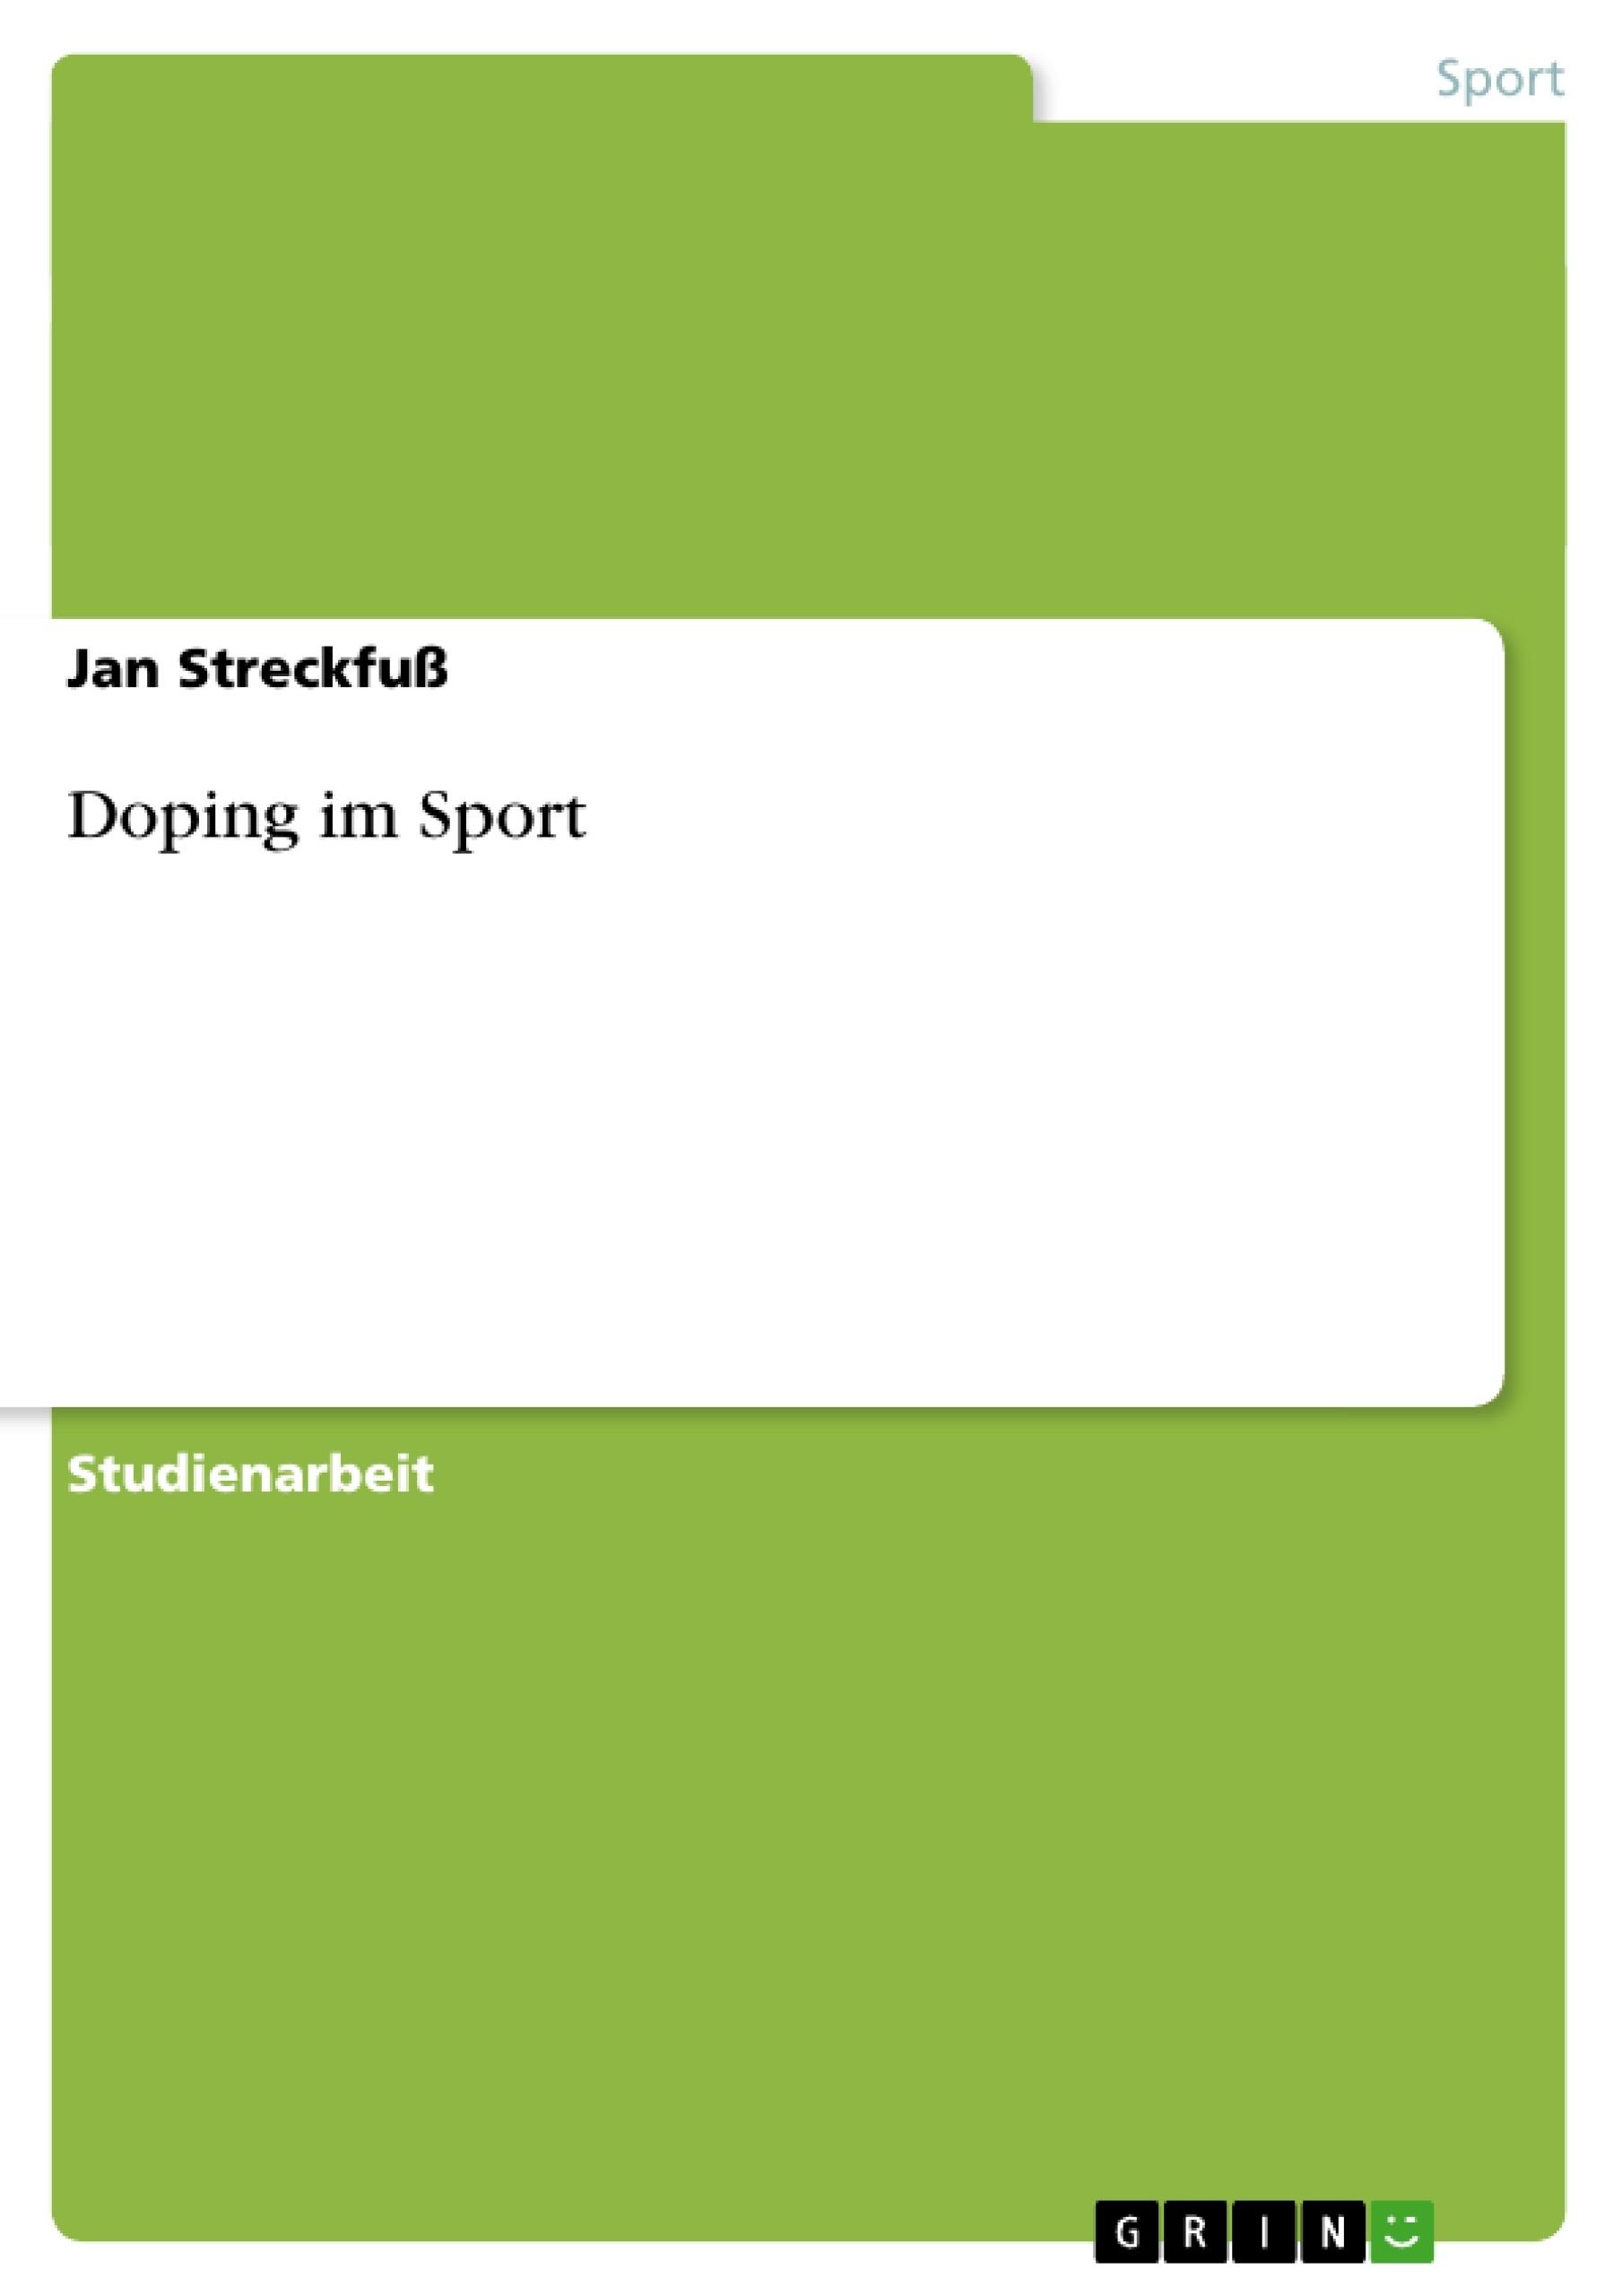 Titel: Doping im Sport